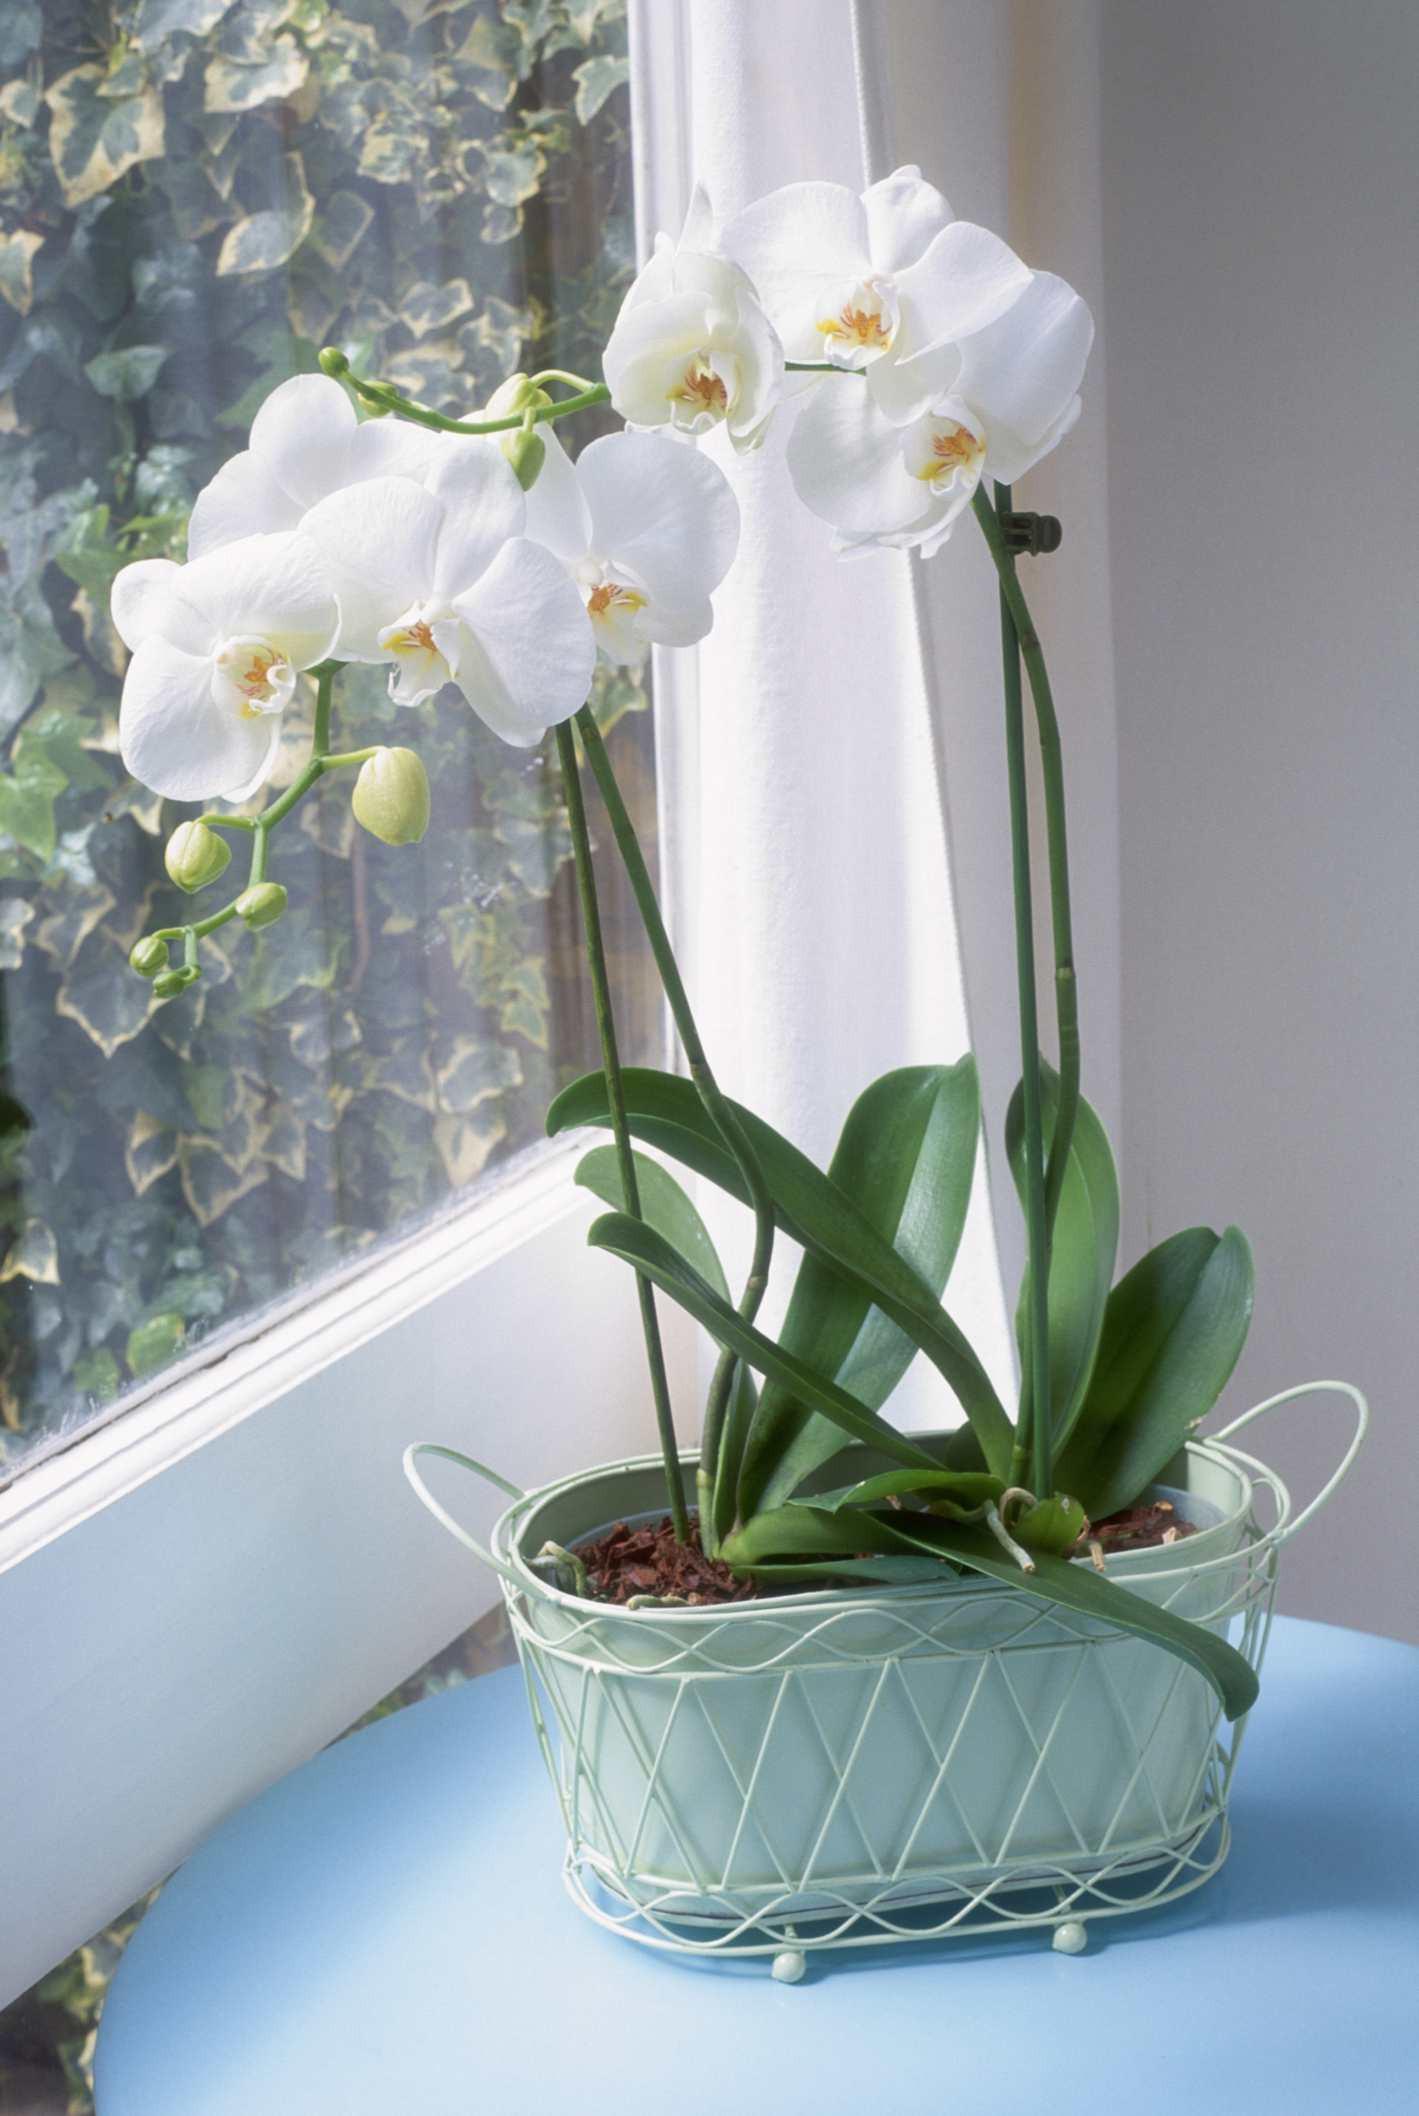 orchidwindow 573b2b2e3df78c6bb0735d58